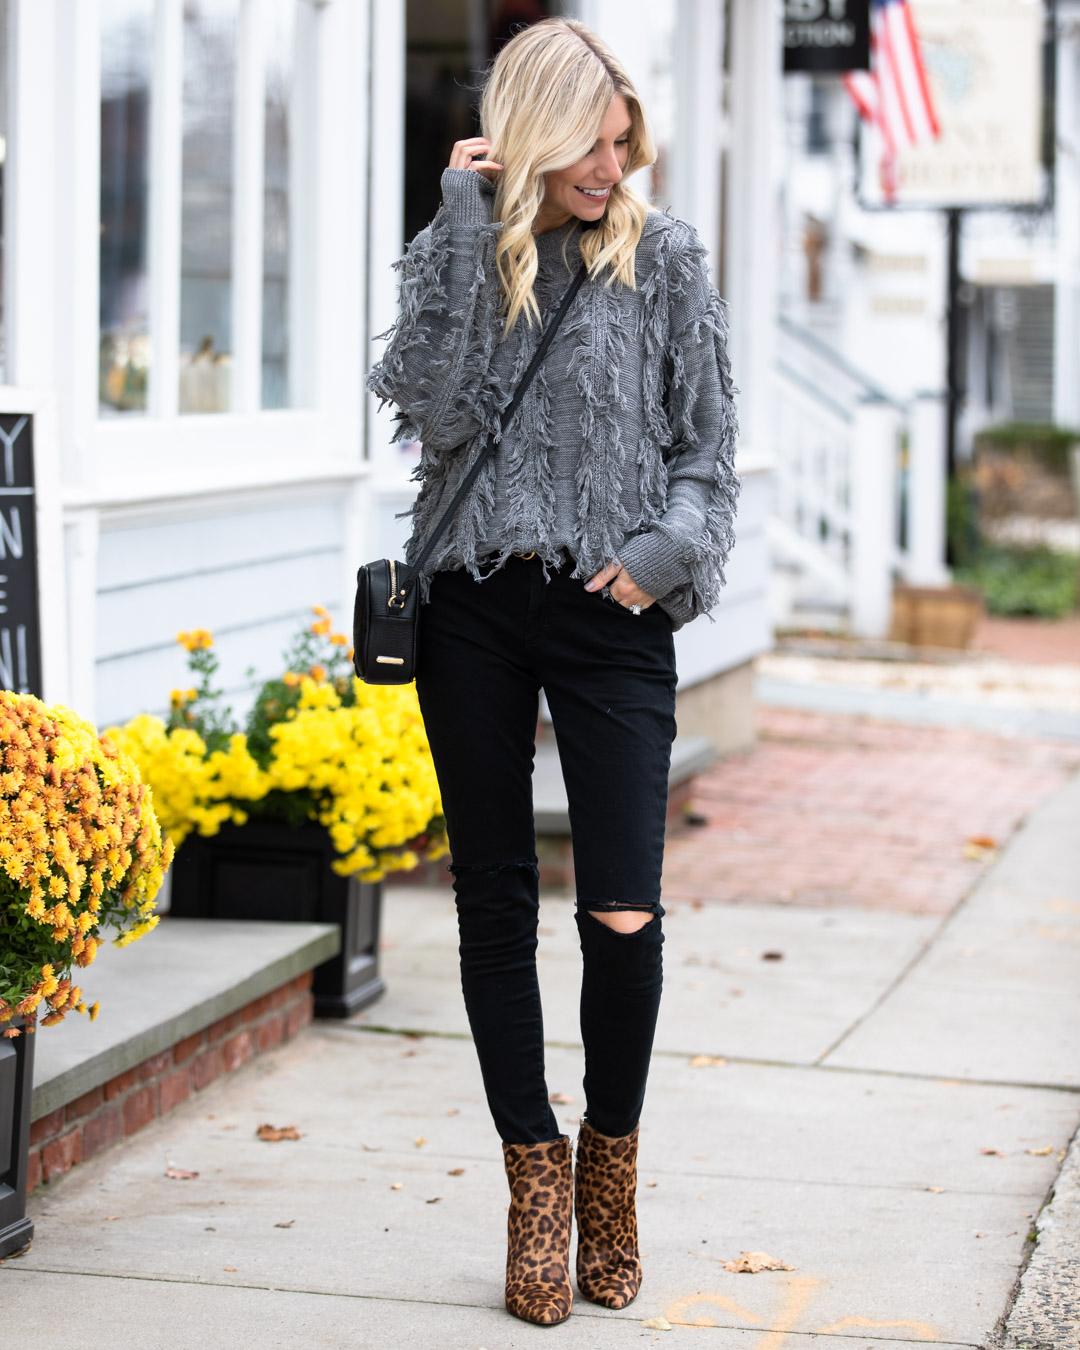 VICI Gray Fringe Sweater